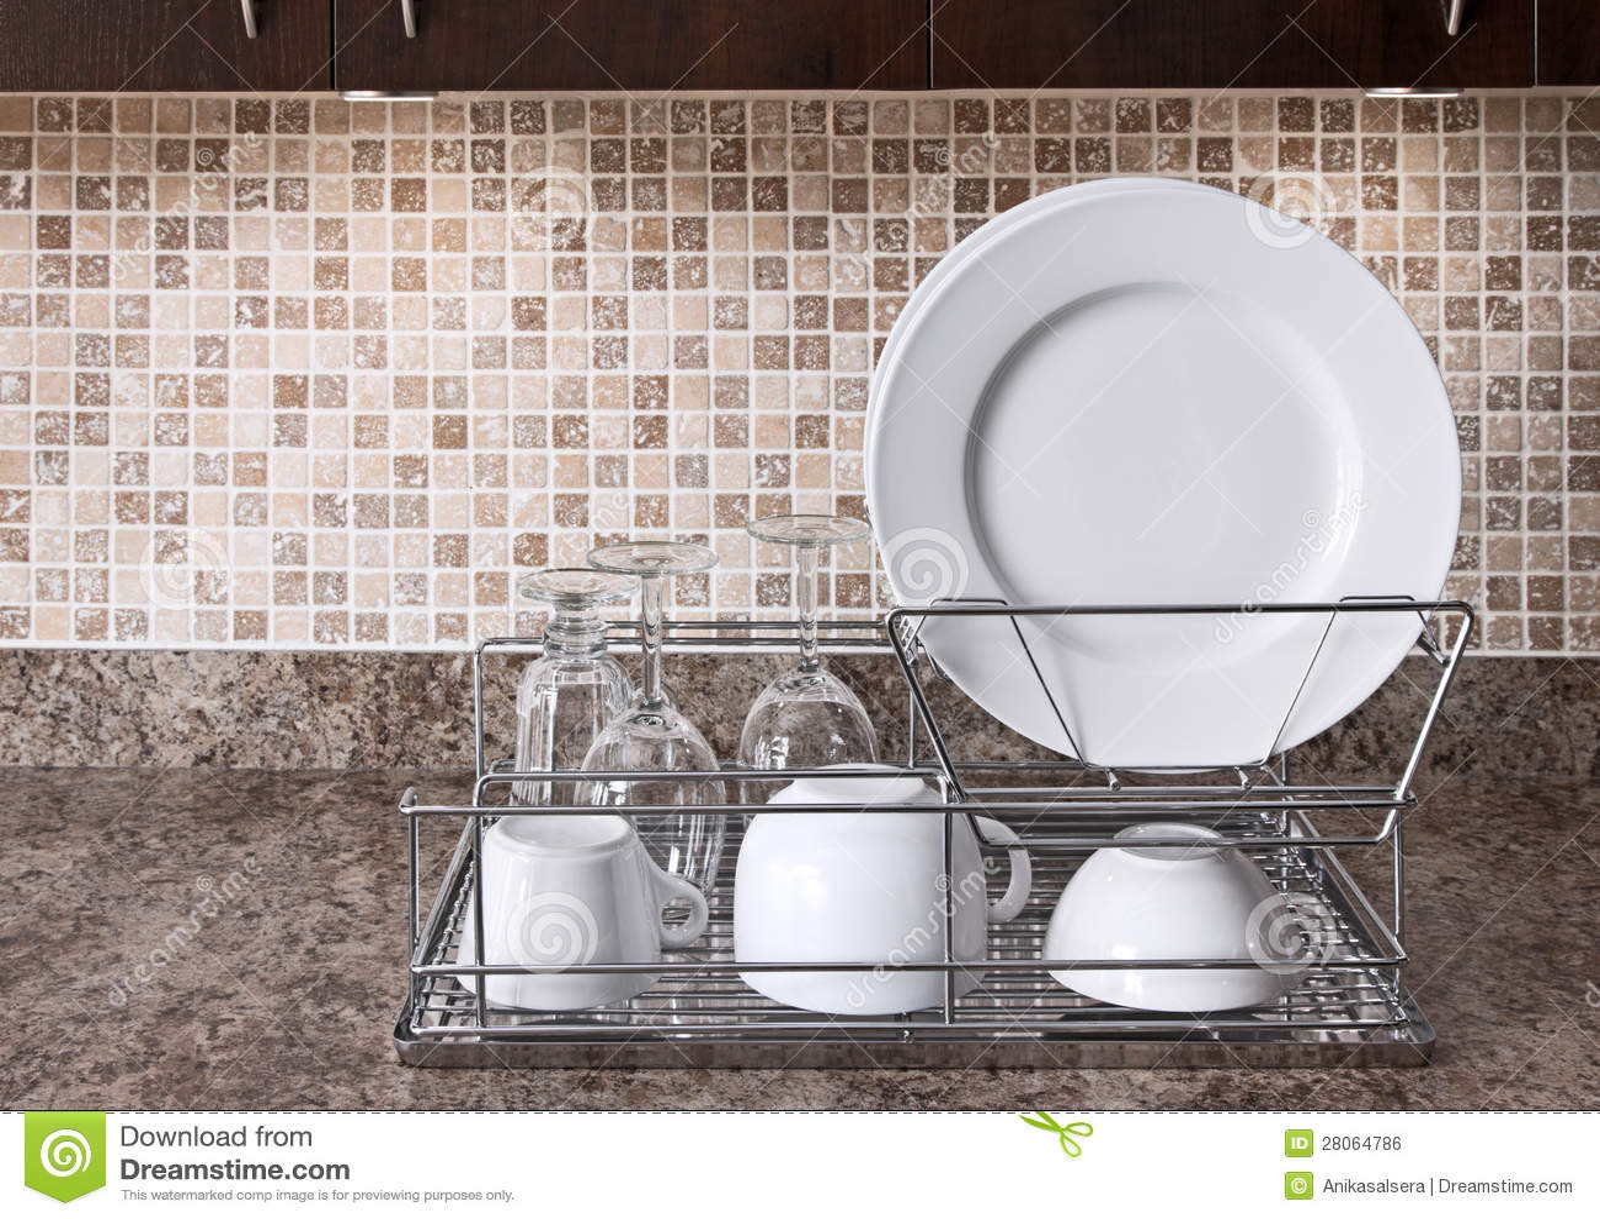 Dish Rack On Kitchen Countertop Royalty Free Stock Image